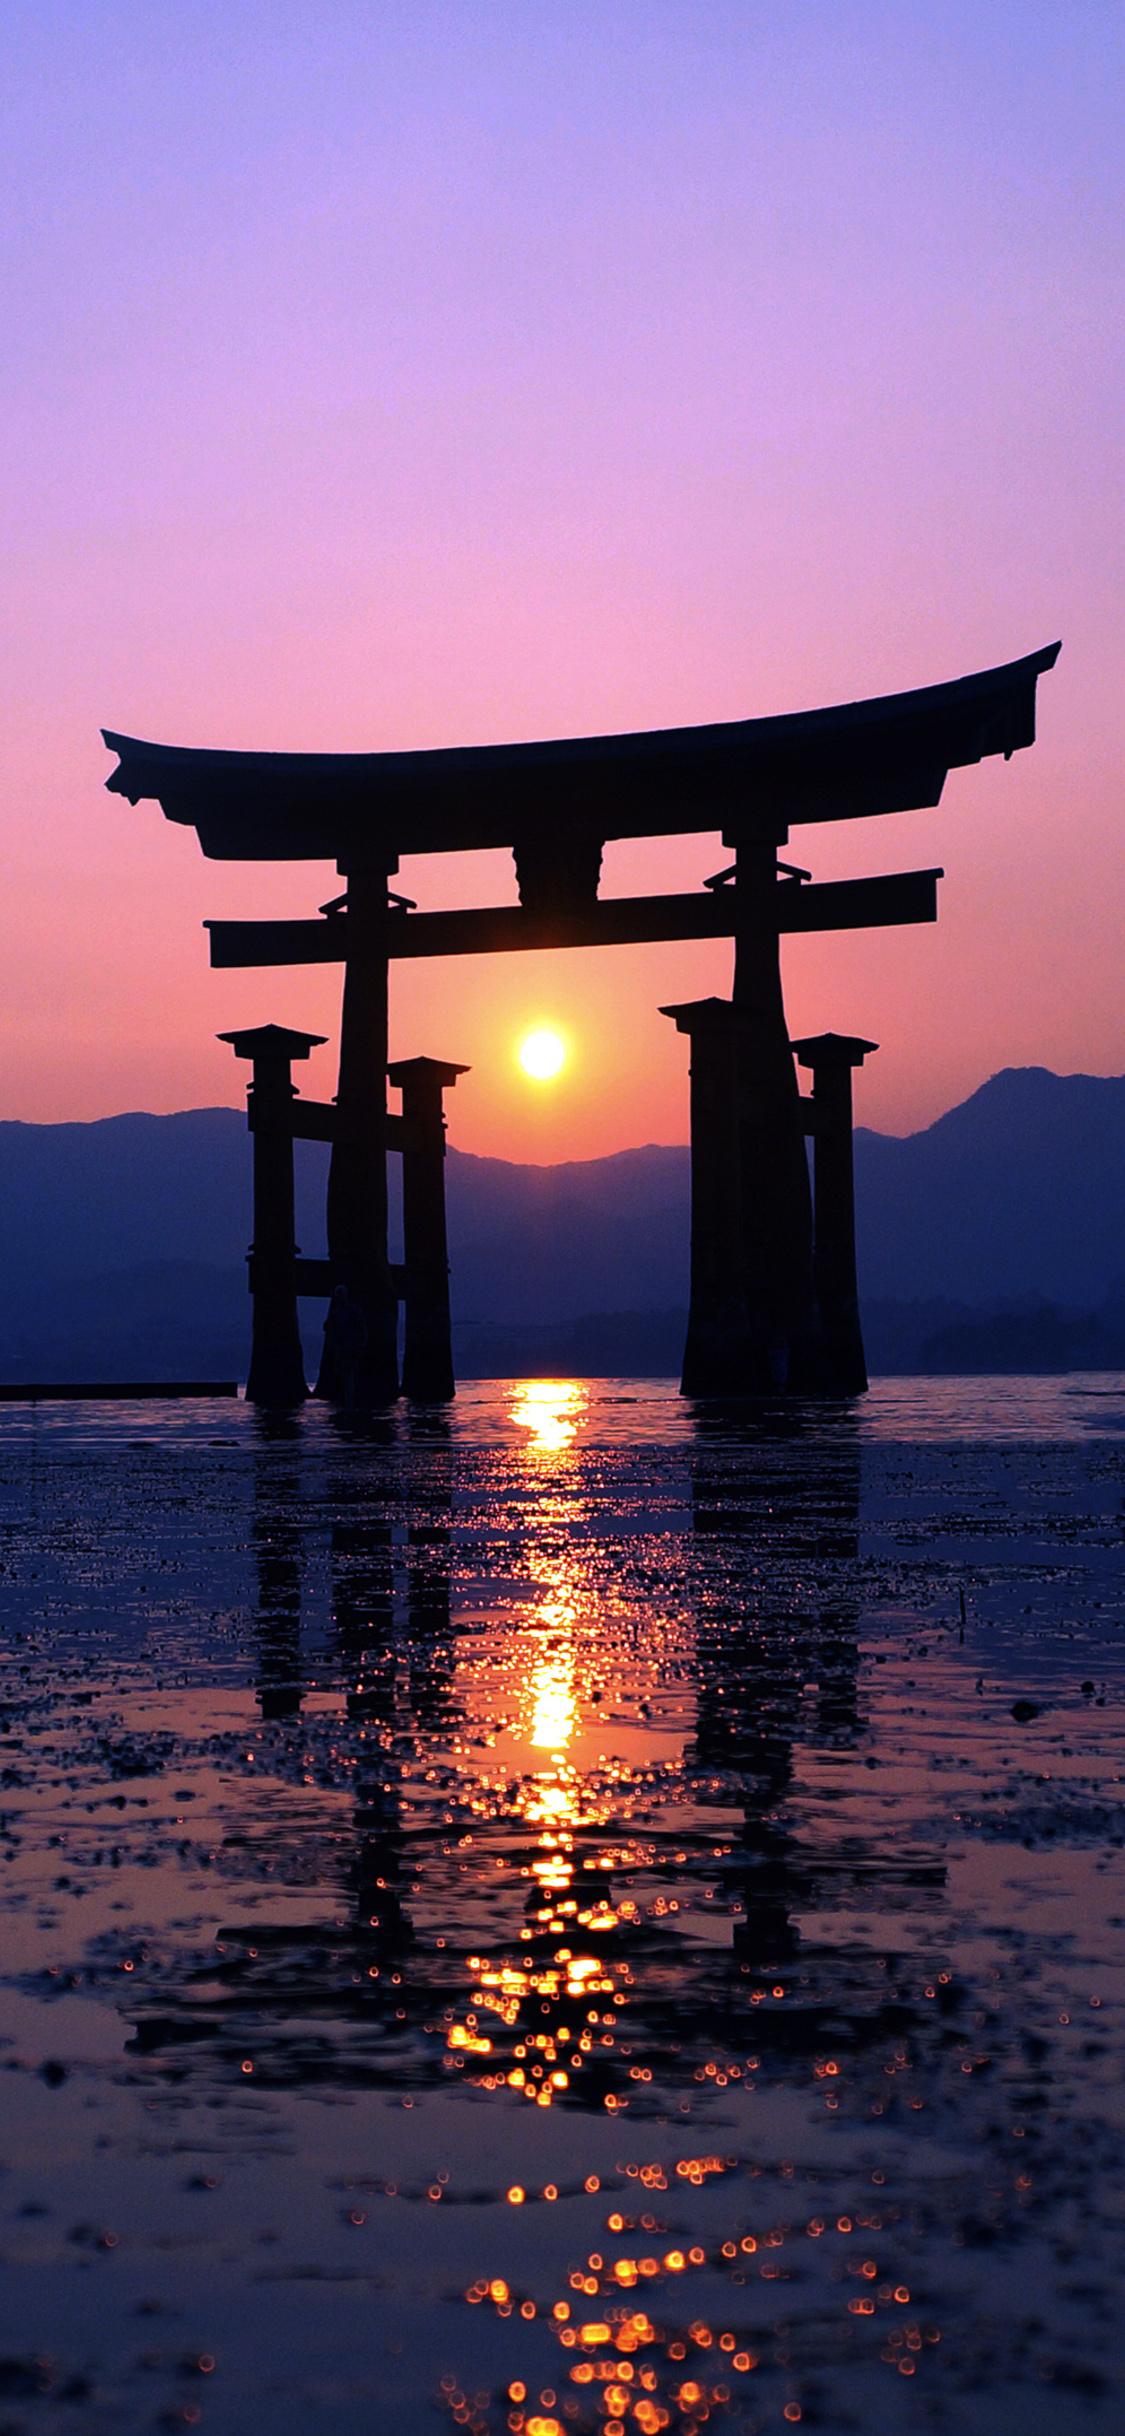 1125x2436 Japan Sunset Purple Evening 4k Iphone Xs Iphone 10